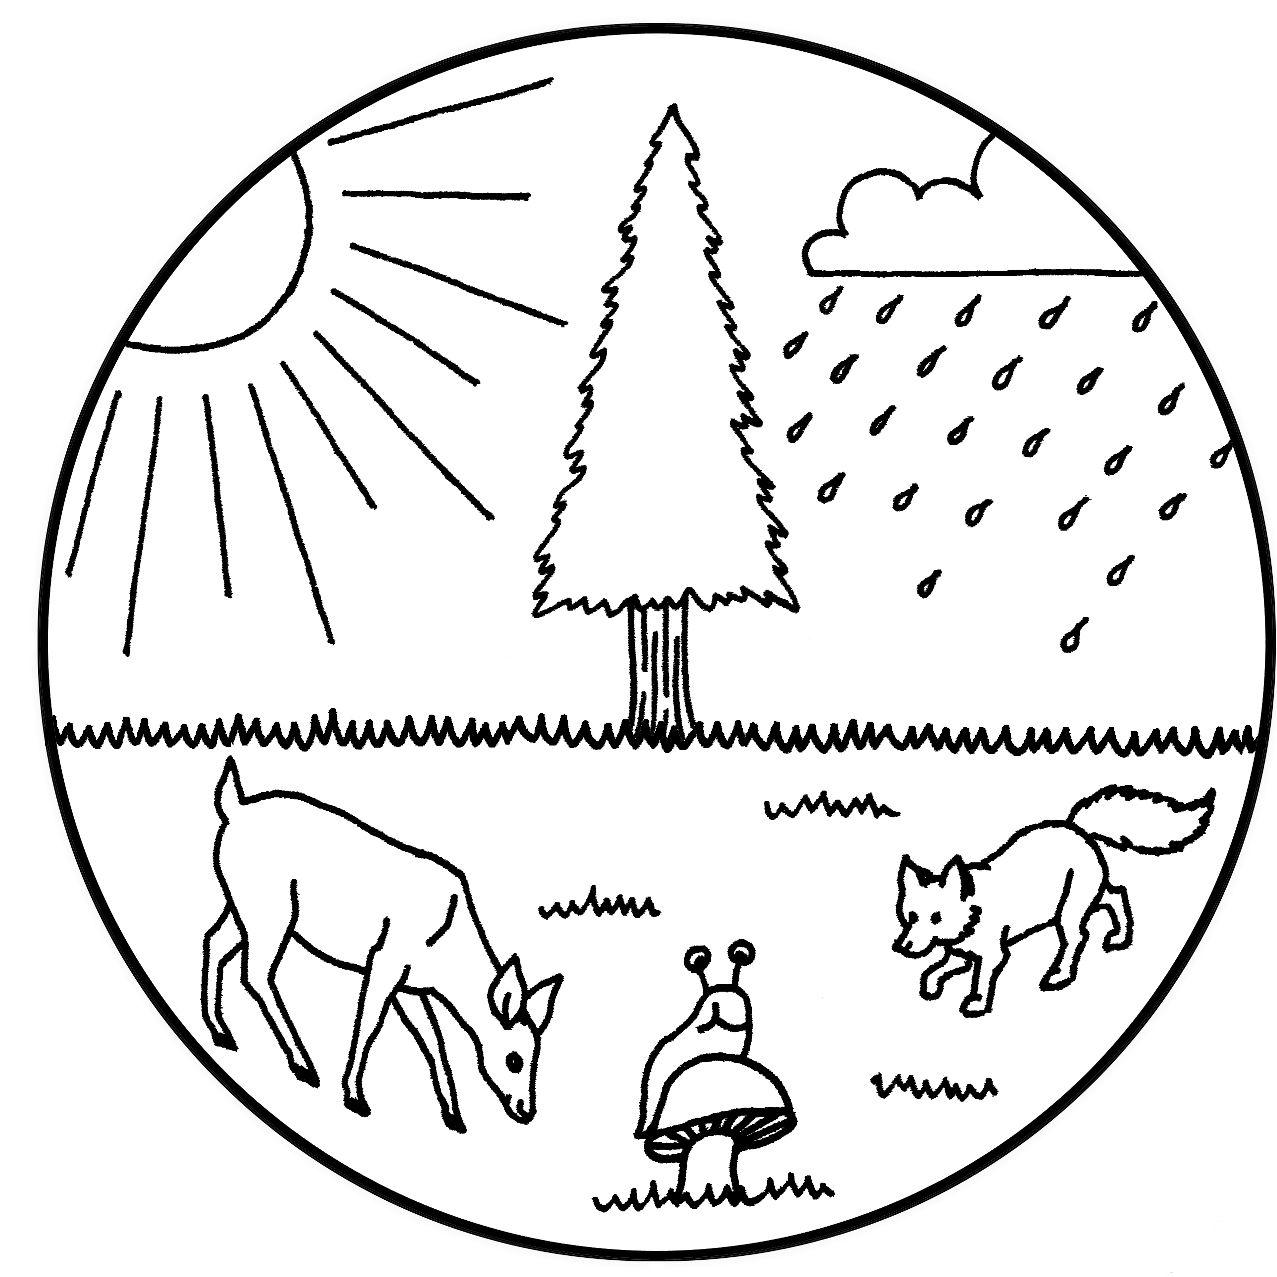 1277x1277 3. Illustrations Cynthia Linsenbardt Original Art